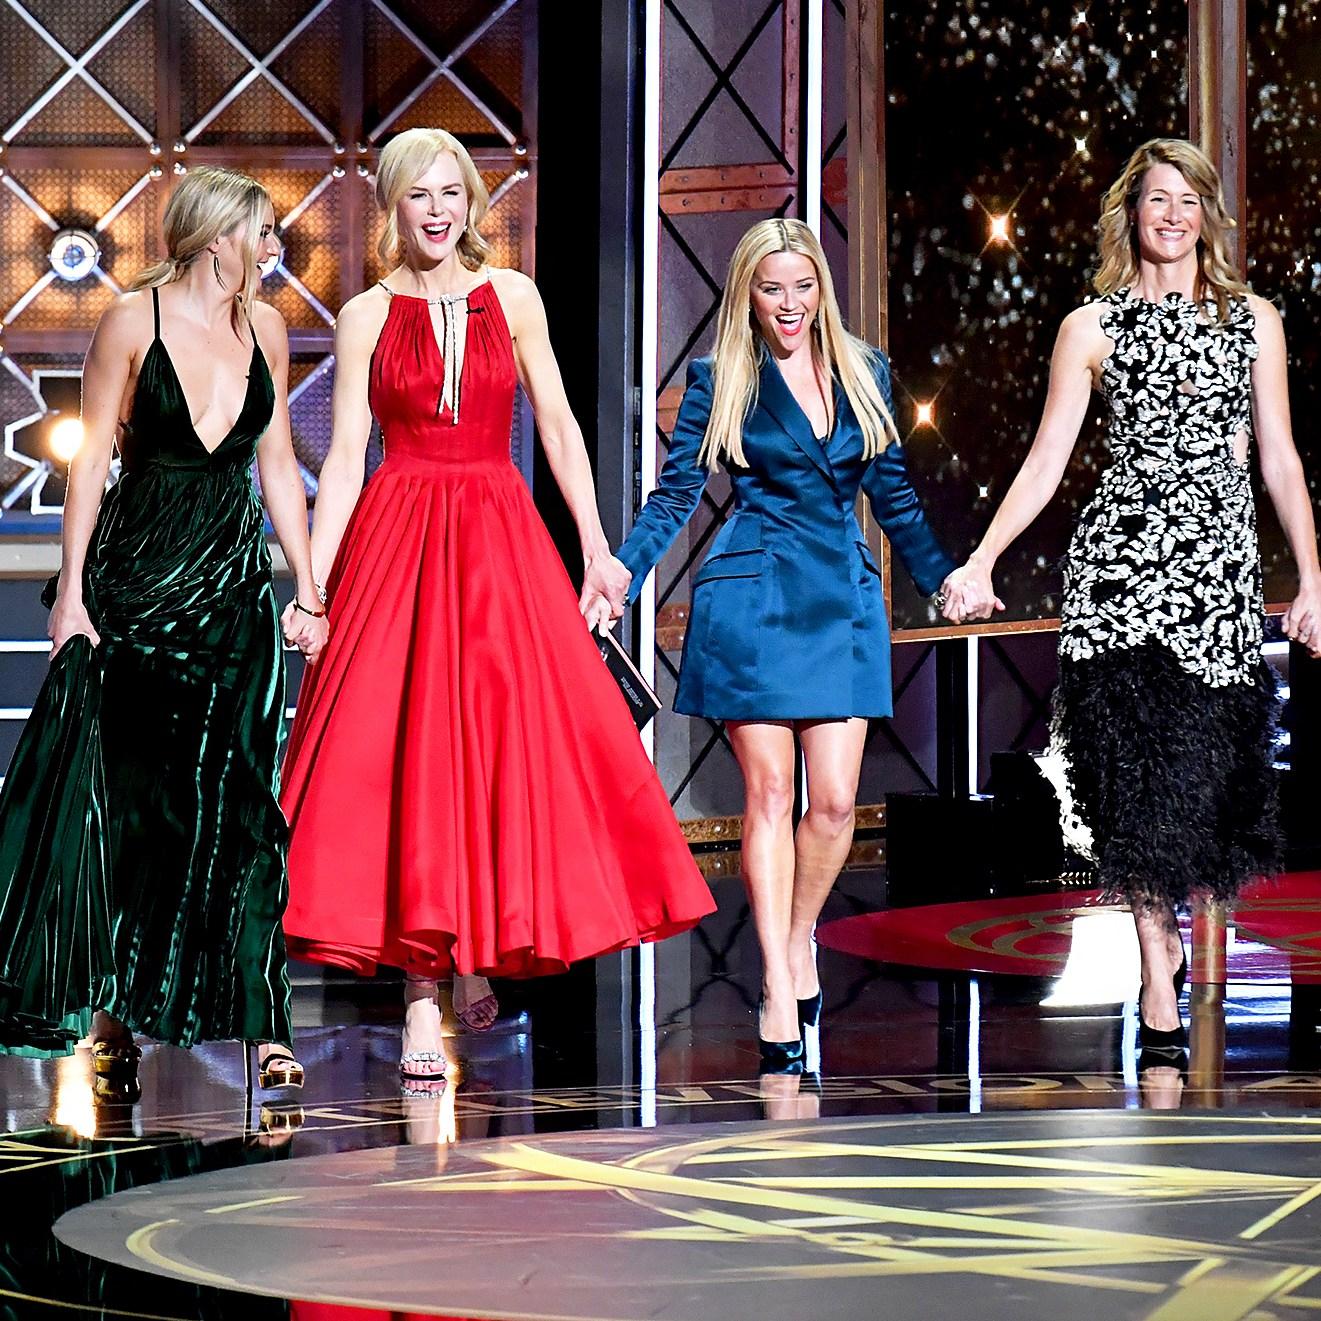 Shailene Woodley, Nicole Kidman, Reese Witherspoon, Laura Dern and Zoe Kravitz